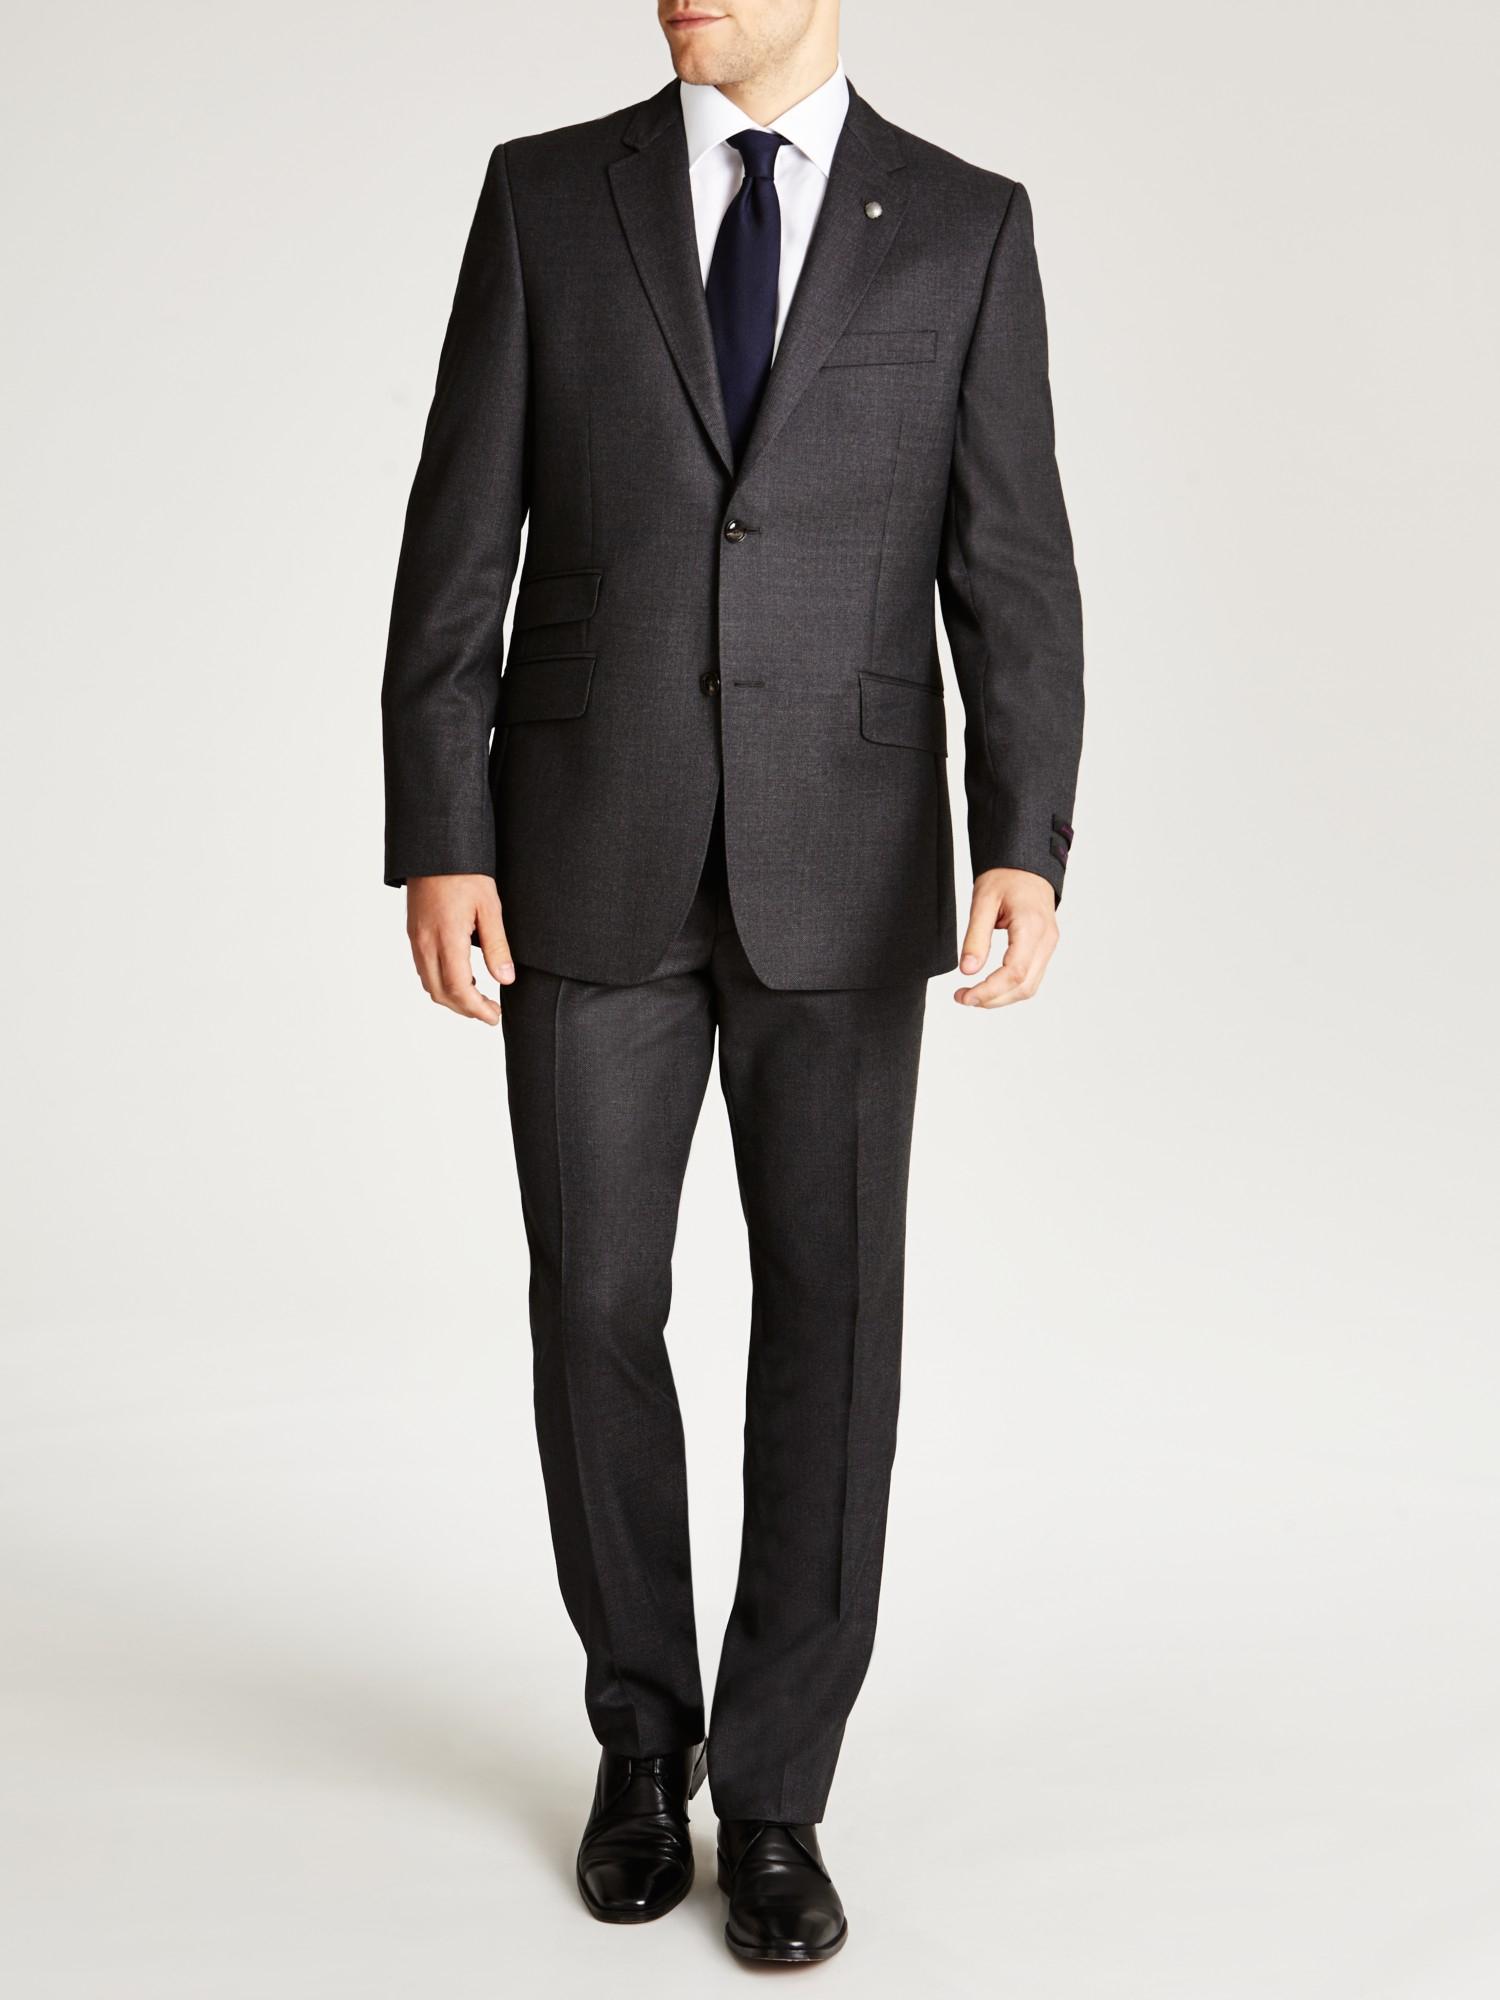 c810b5da2732 Ted Baker Endurance Foxdale Sterling Birdseye Tailored Suit Jacket ...